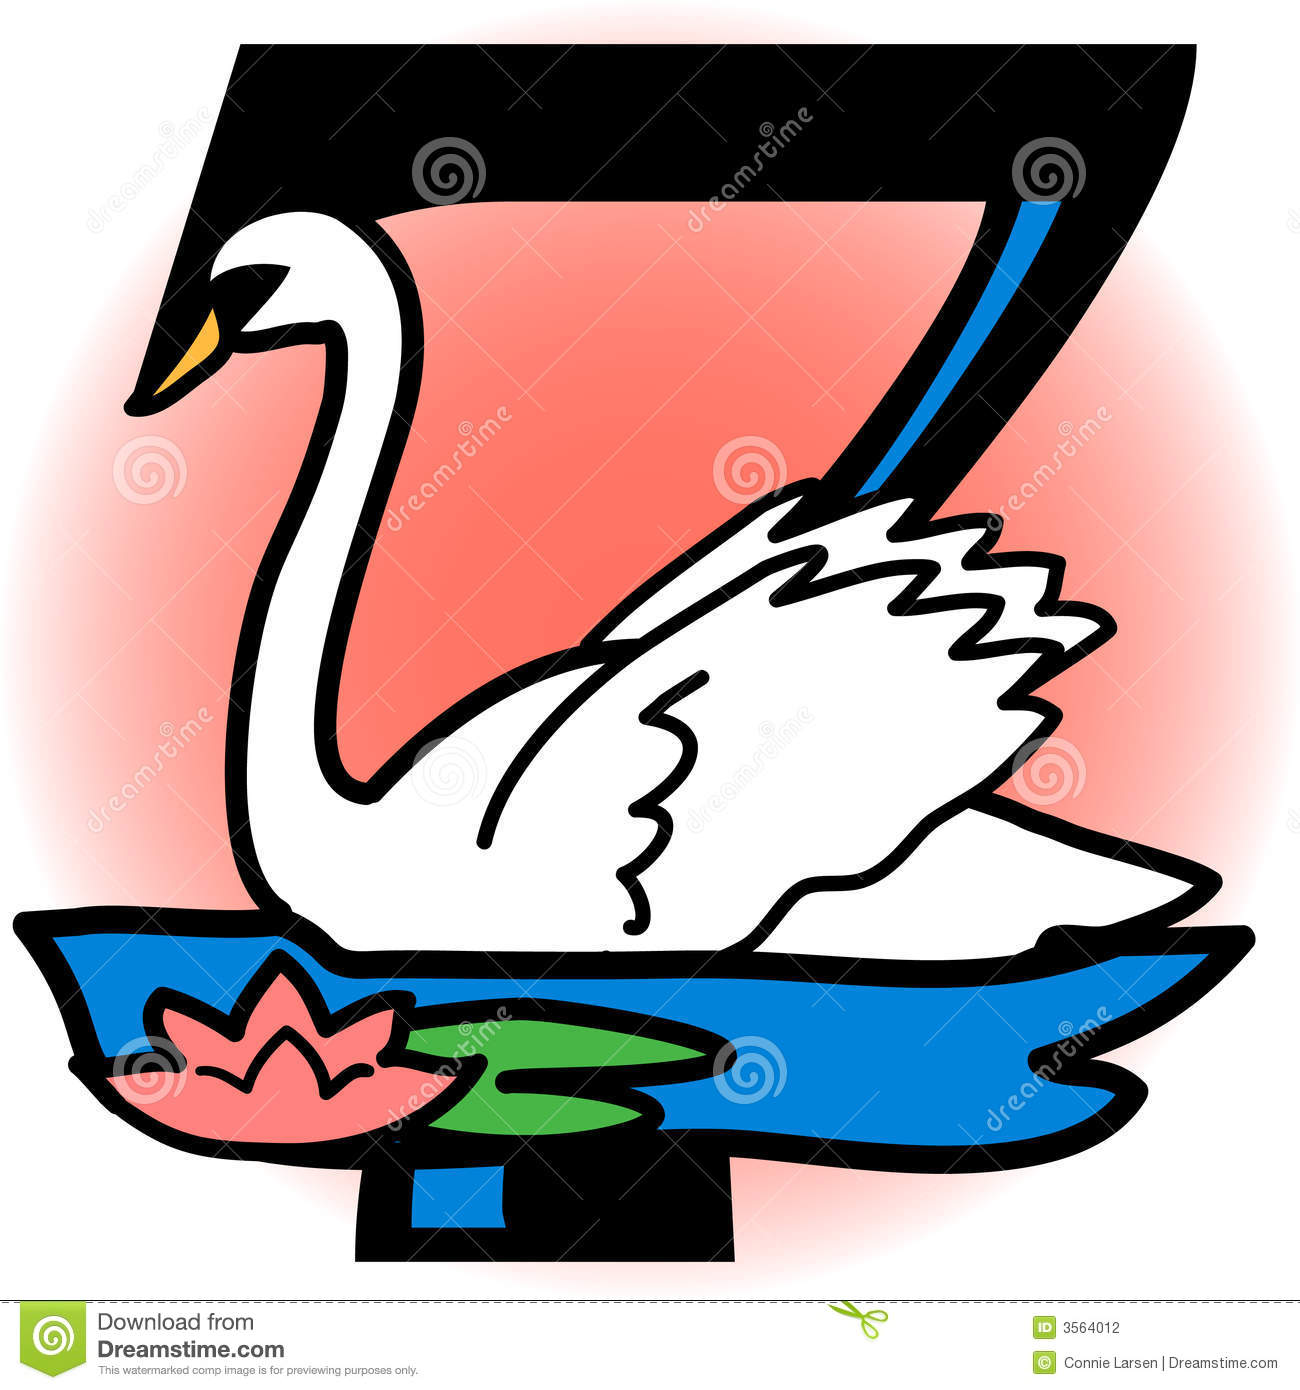 Seven Swans A Swimming/eps stock vector. Illustration of seasonal.